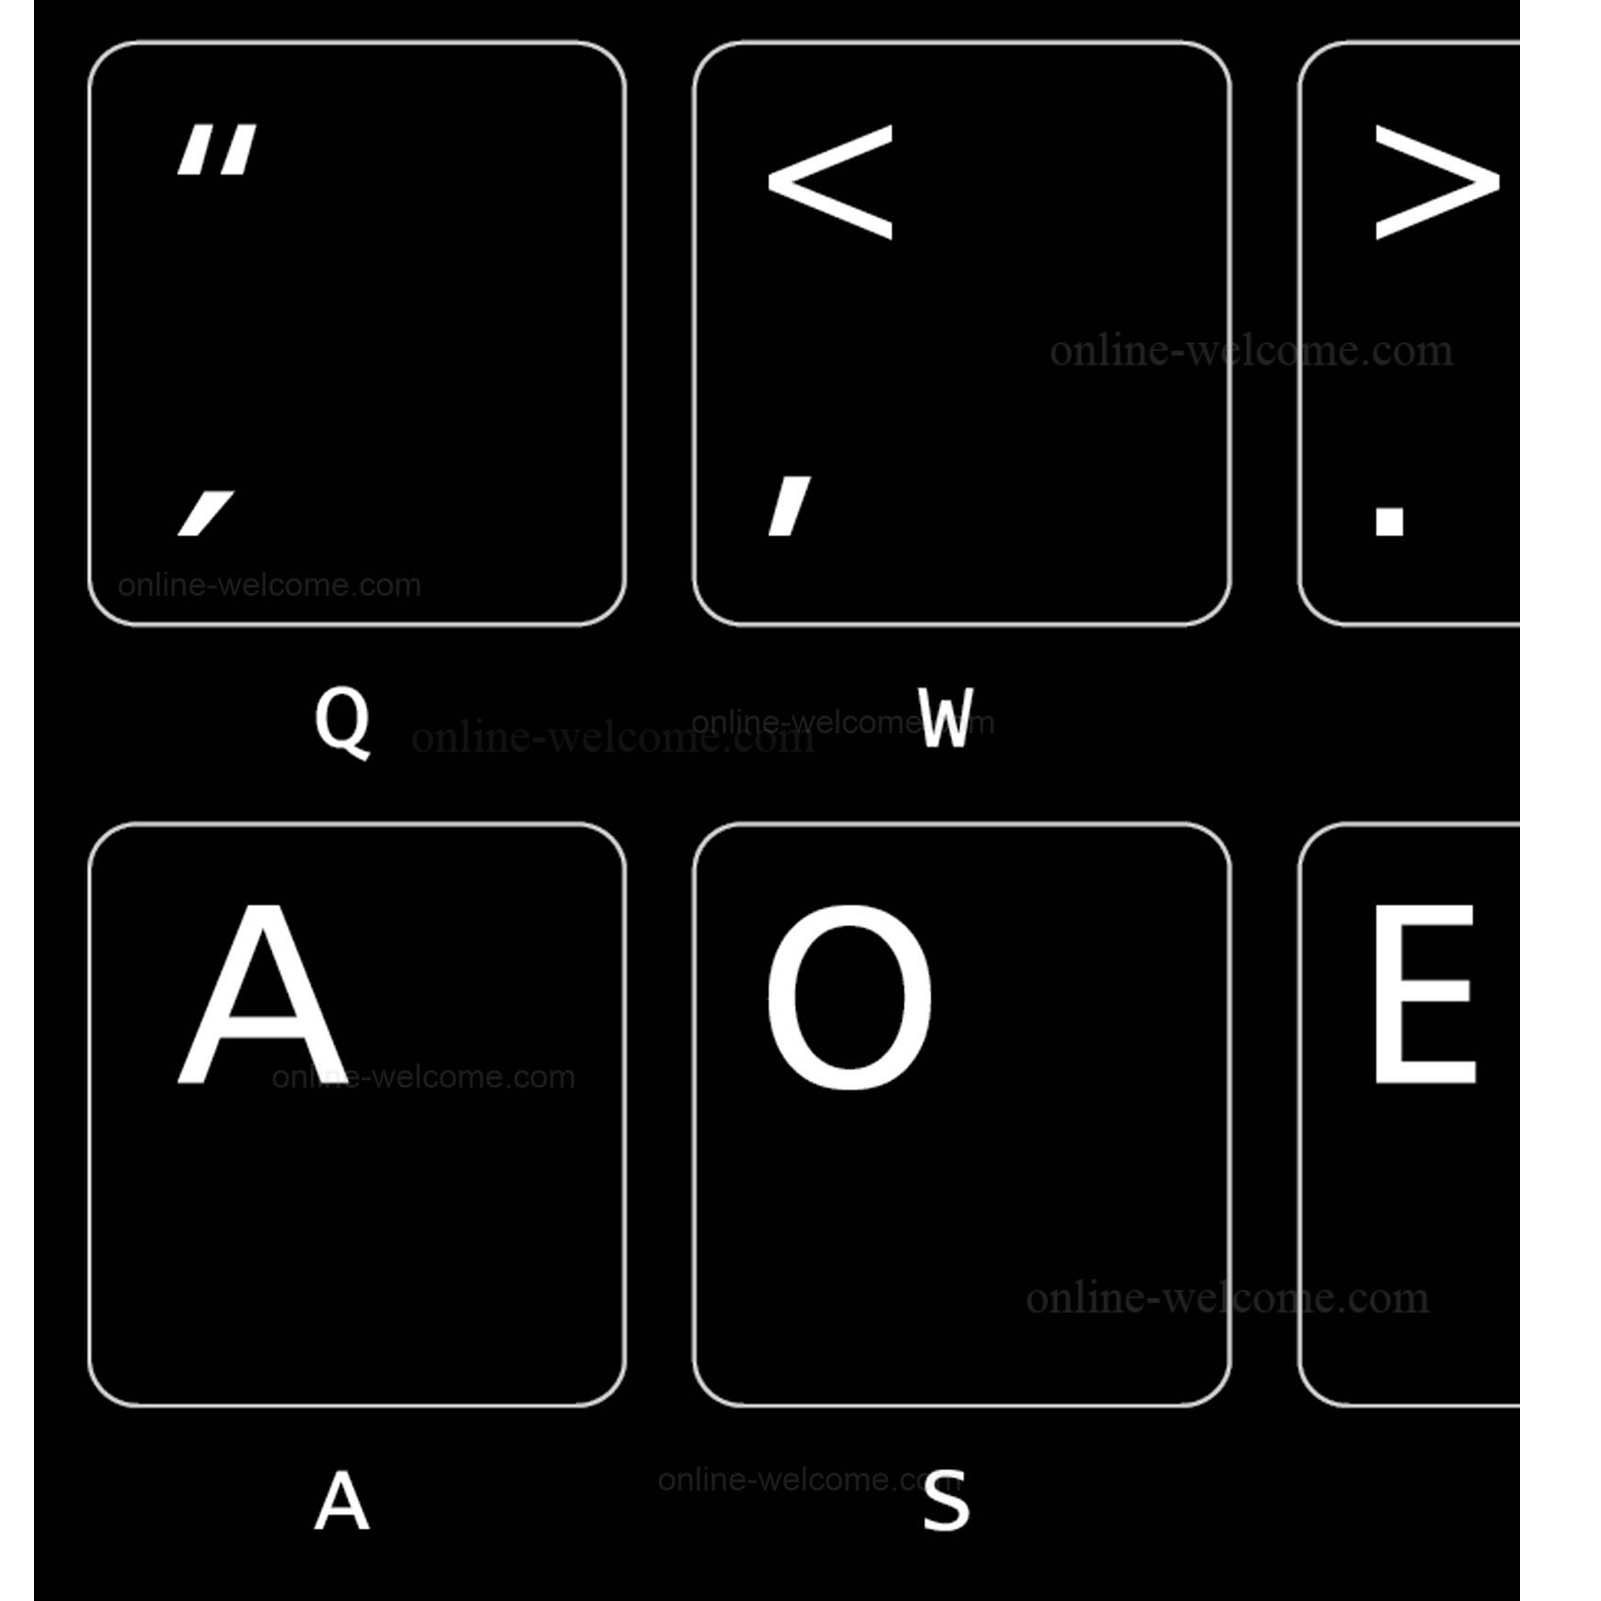 Dvorak layout for keyboard black